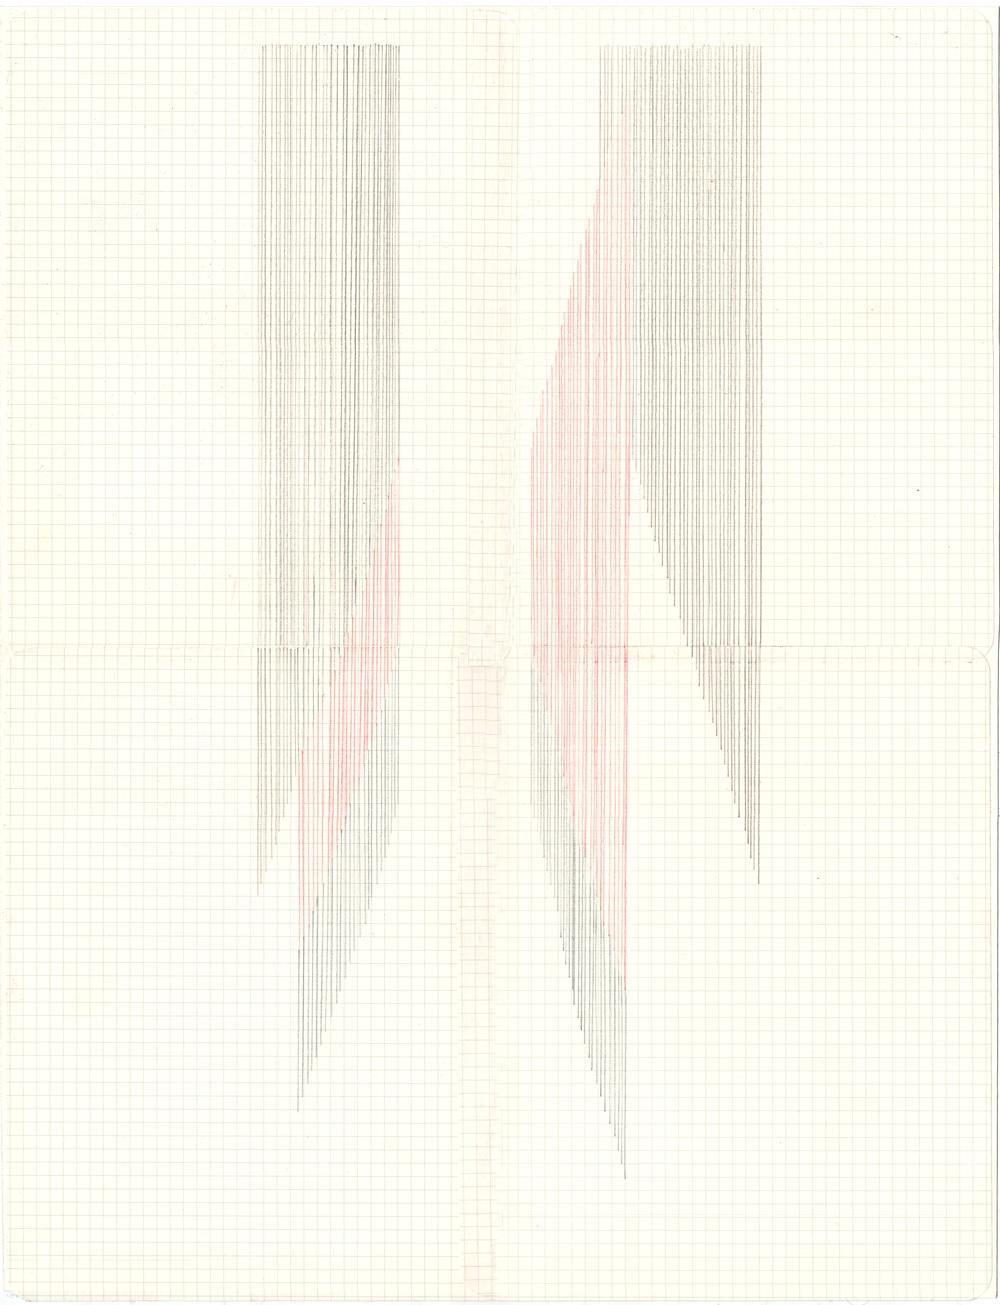 Haleh Redjaian  Flow , 2014 colored pencil on paper (framed), 42 x 29,7 cm